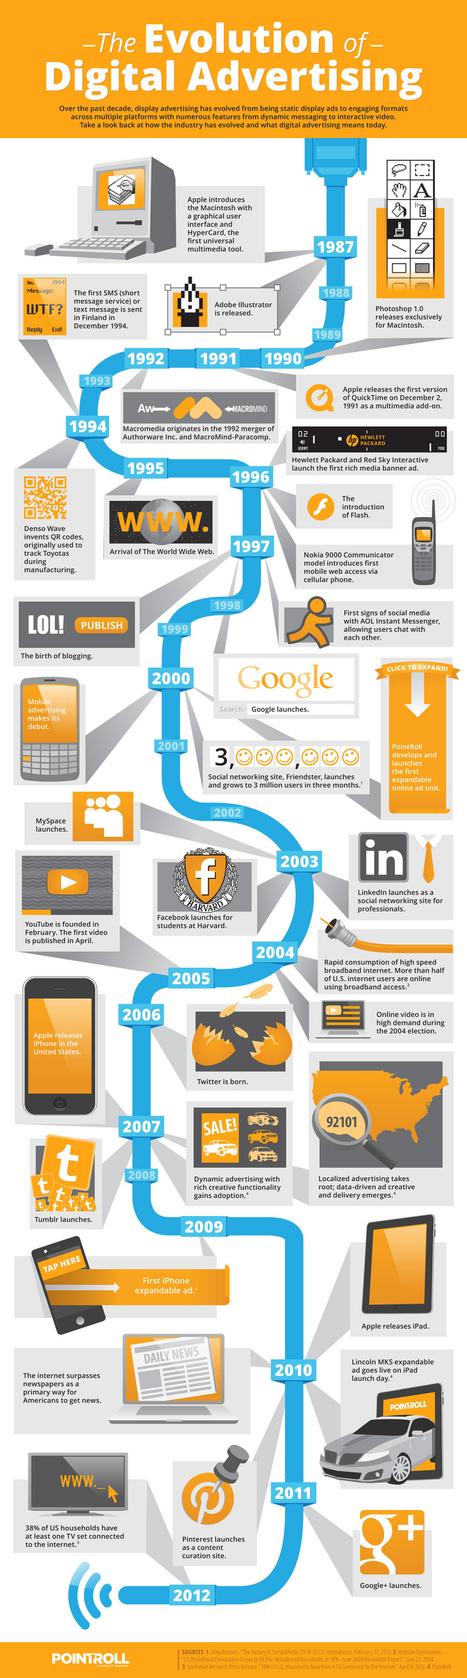 The Evolution of Digital Advertising [INFOGRAPHIC] | Digital Marketing Buzz | Scoop.it